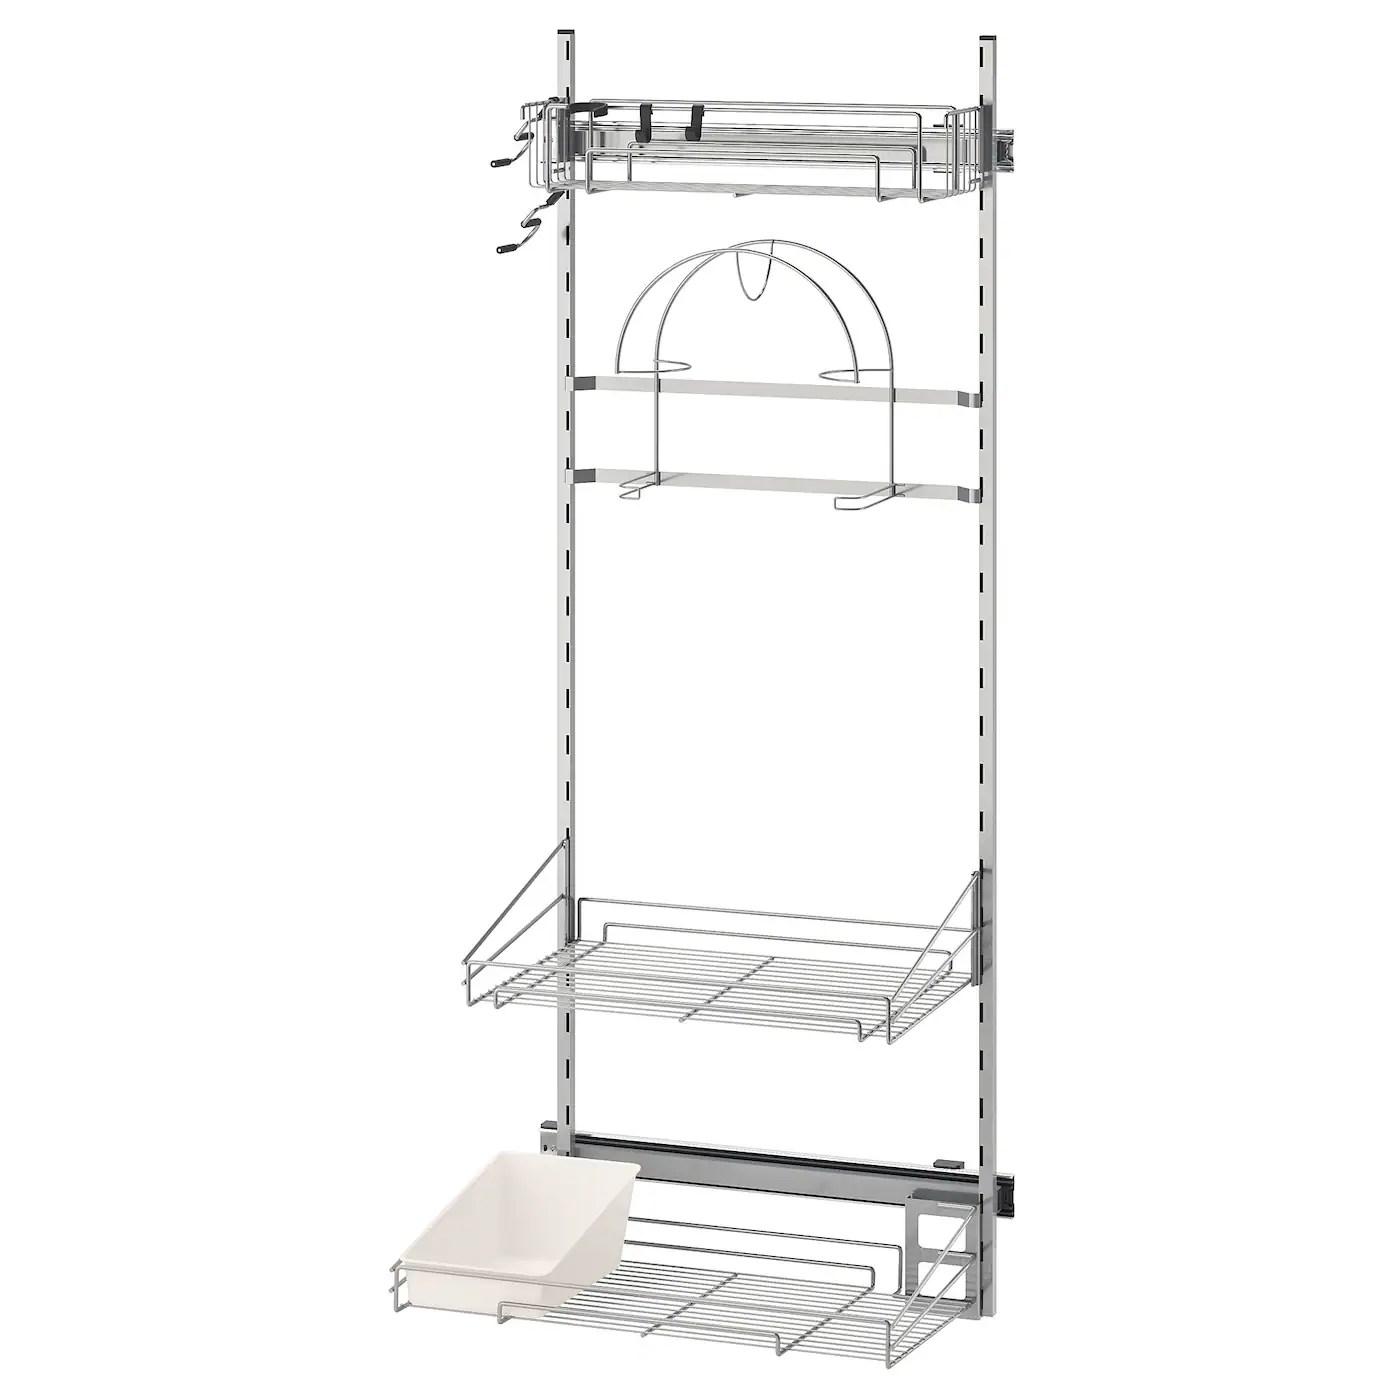 33 modelli di cucine ikea: Utrusta Accessori Interni Prodotti Pulizie Ikea It